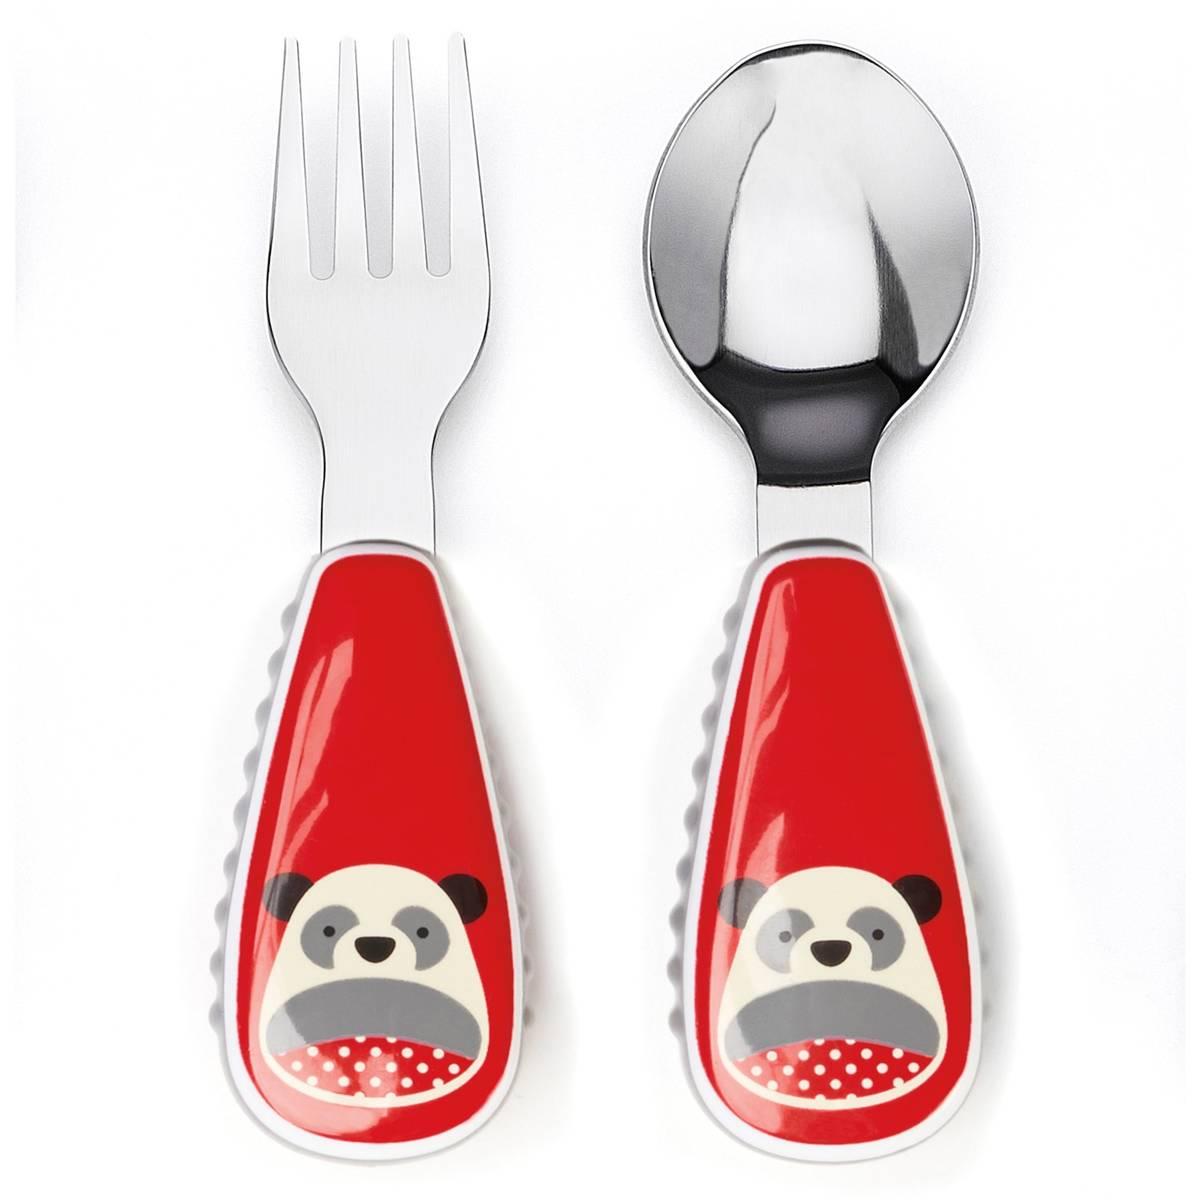 Panda - Metalliset aterimet - 149576246 - 1